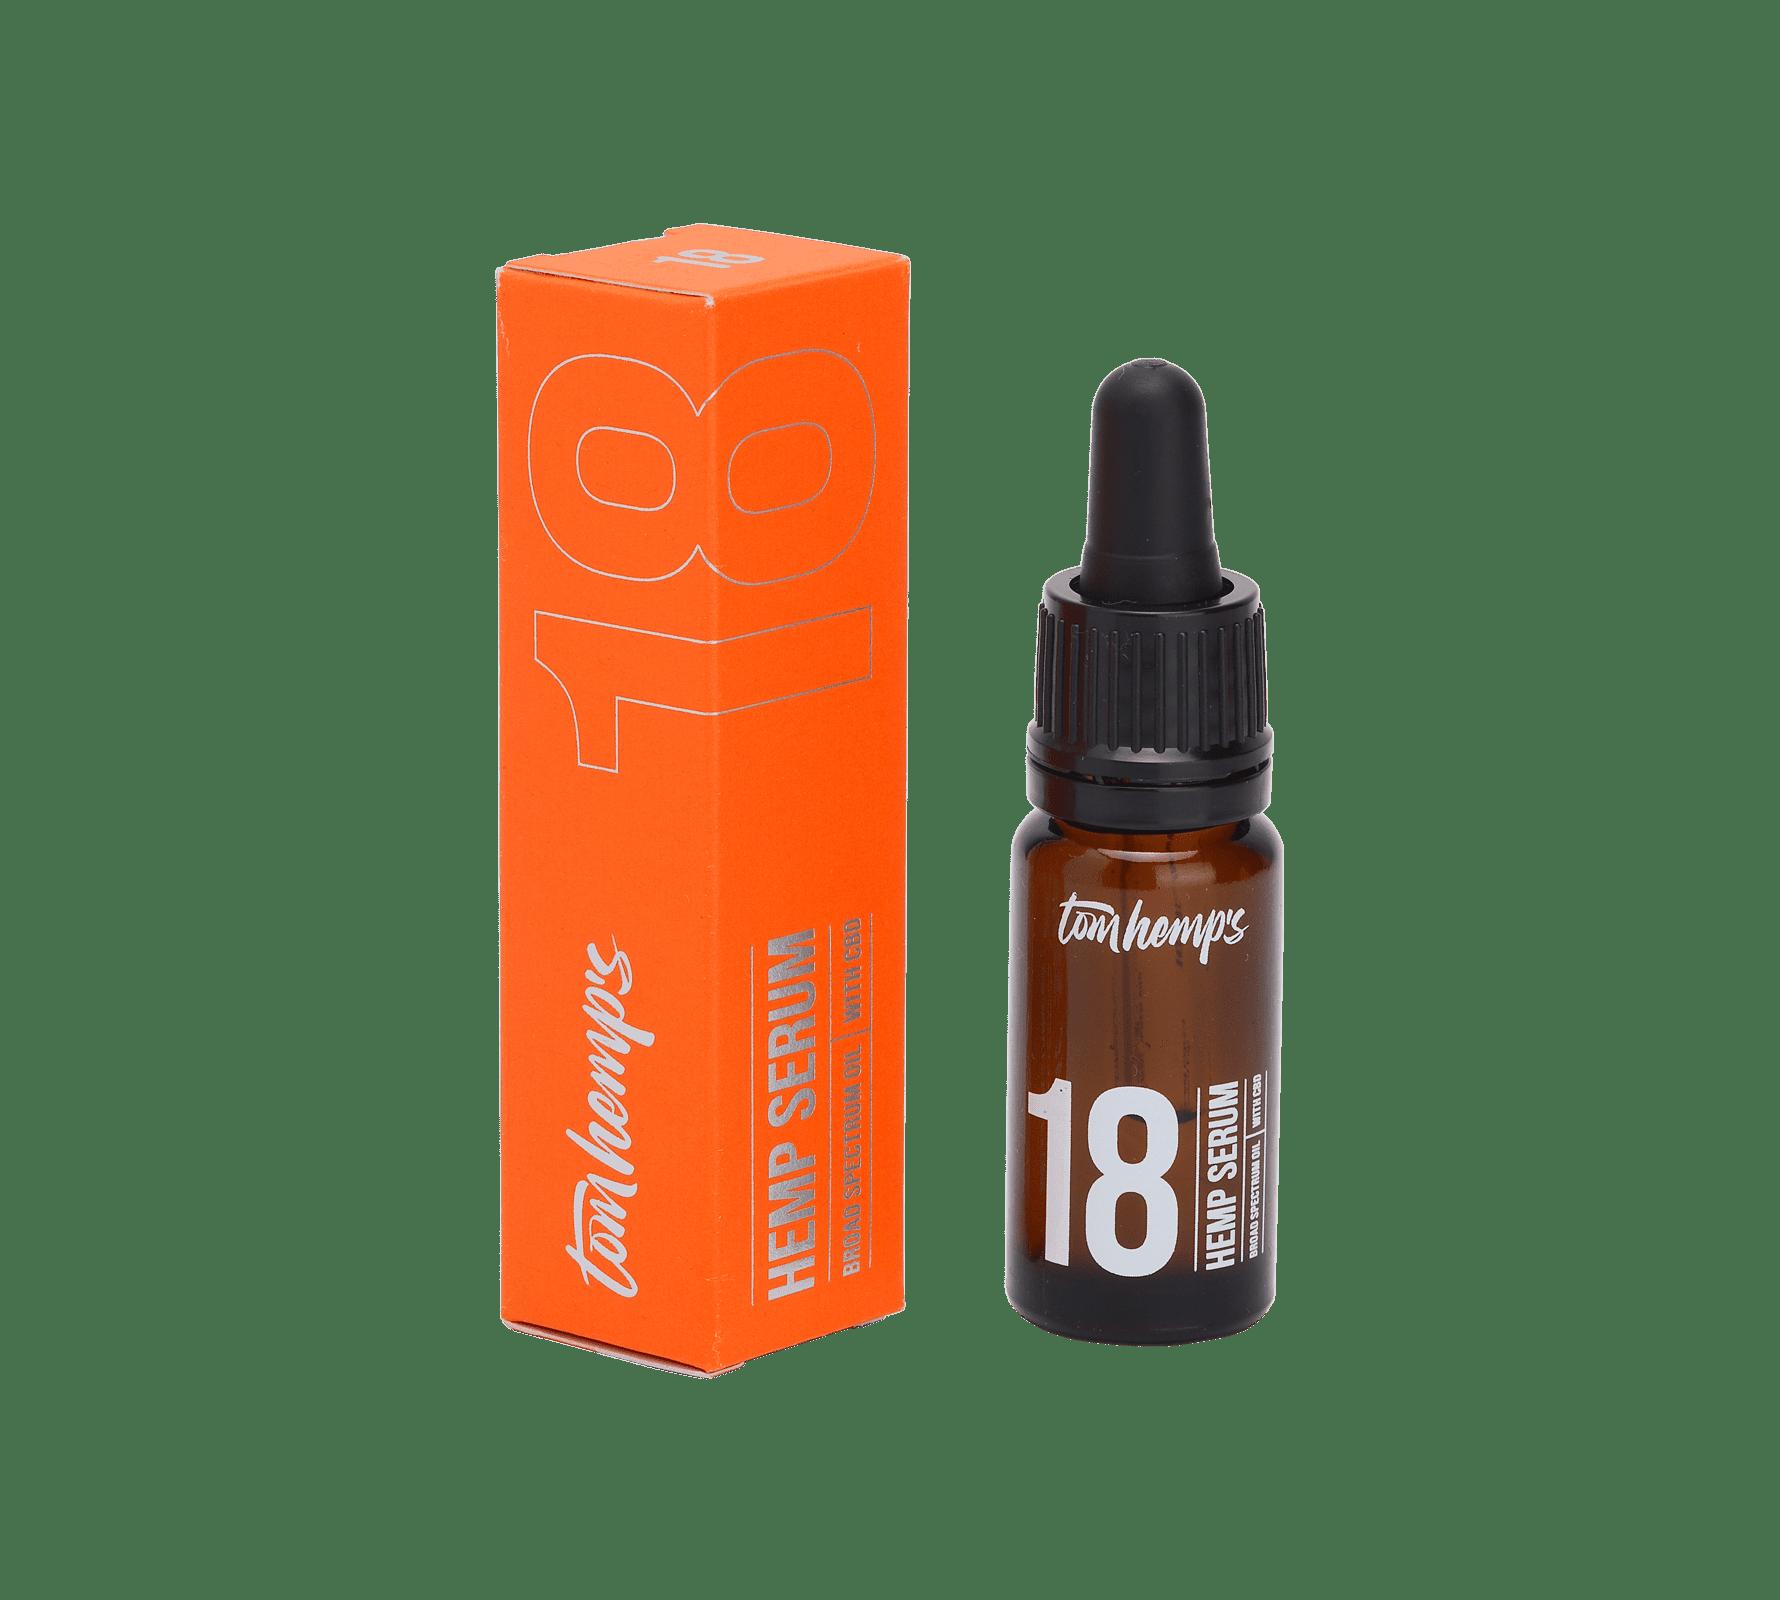 Tom Hemps Product Beauty Hemp Serum Bottle 18